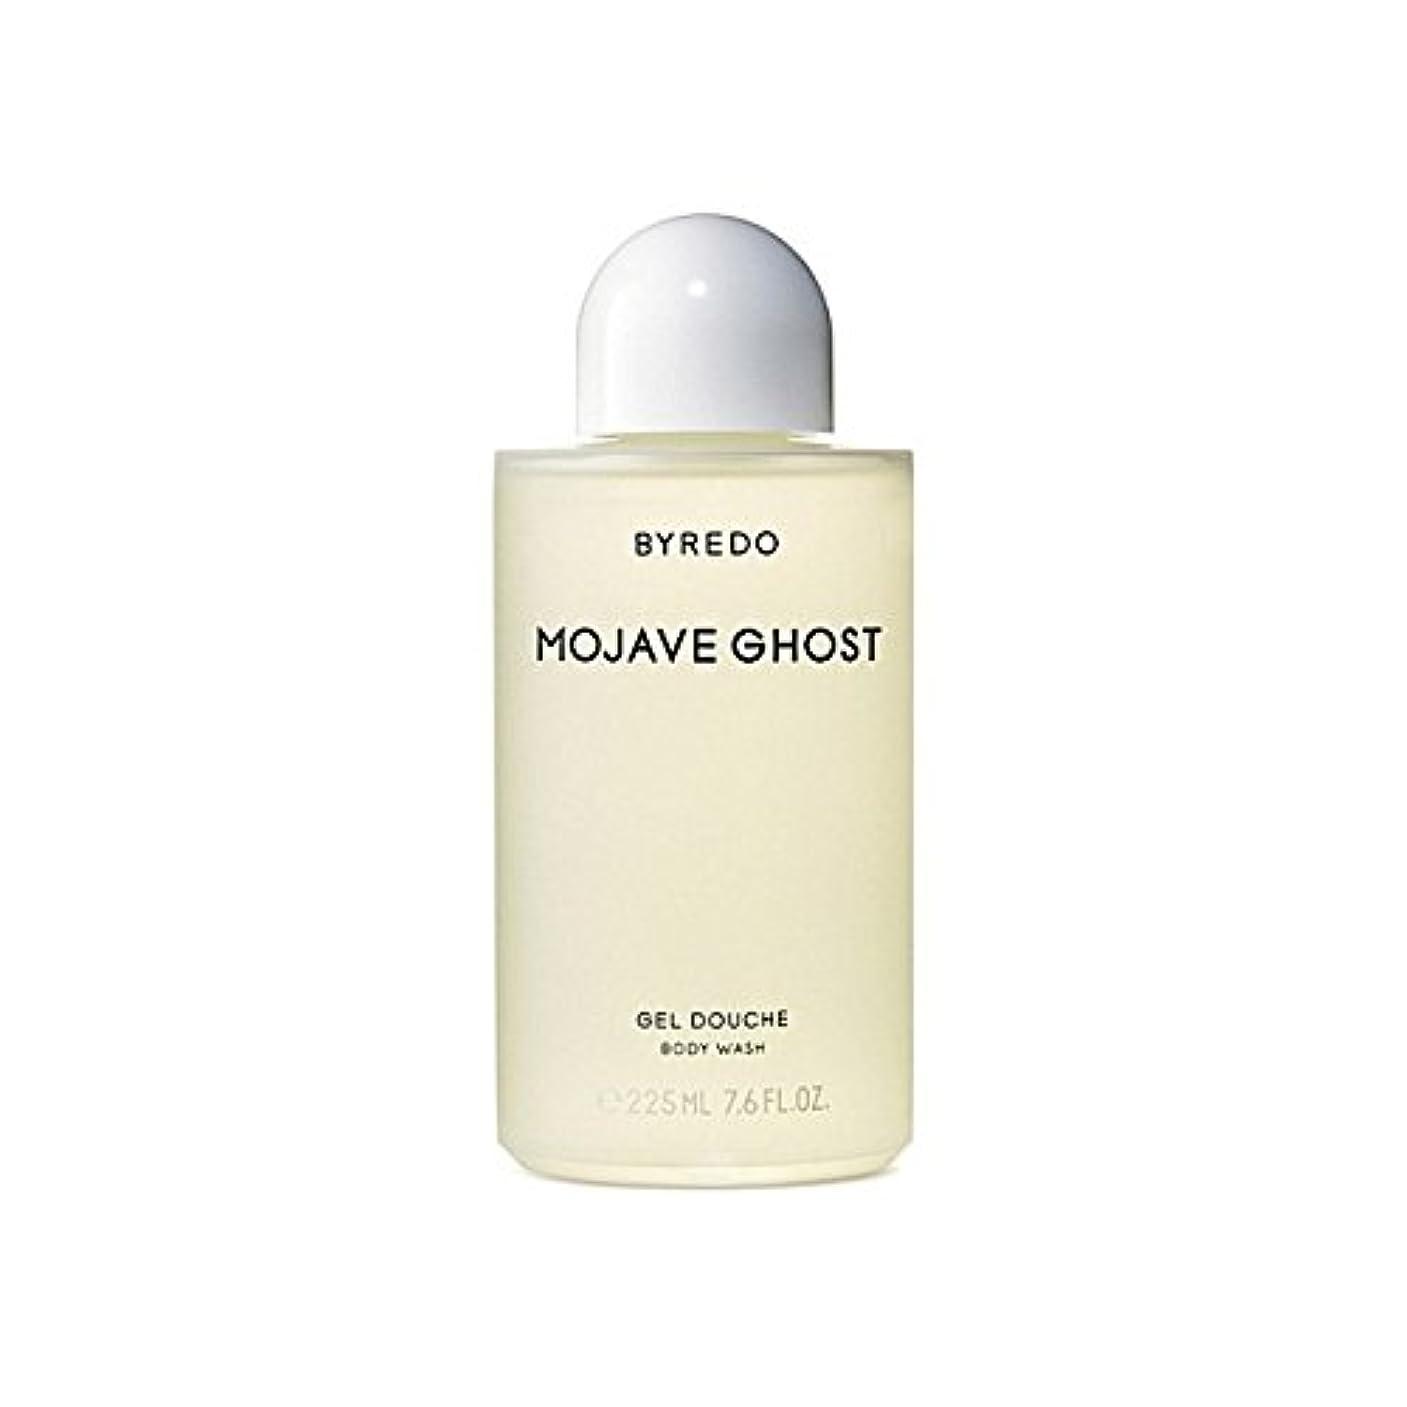 Byredo Mojave Ghost Body Wash 225ml - モハーベゴーストボディウォッシュ225ミリリットル [並行輸入品]